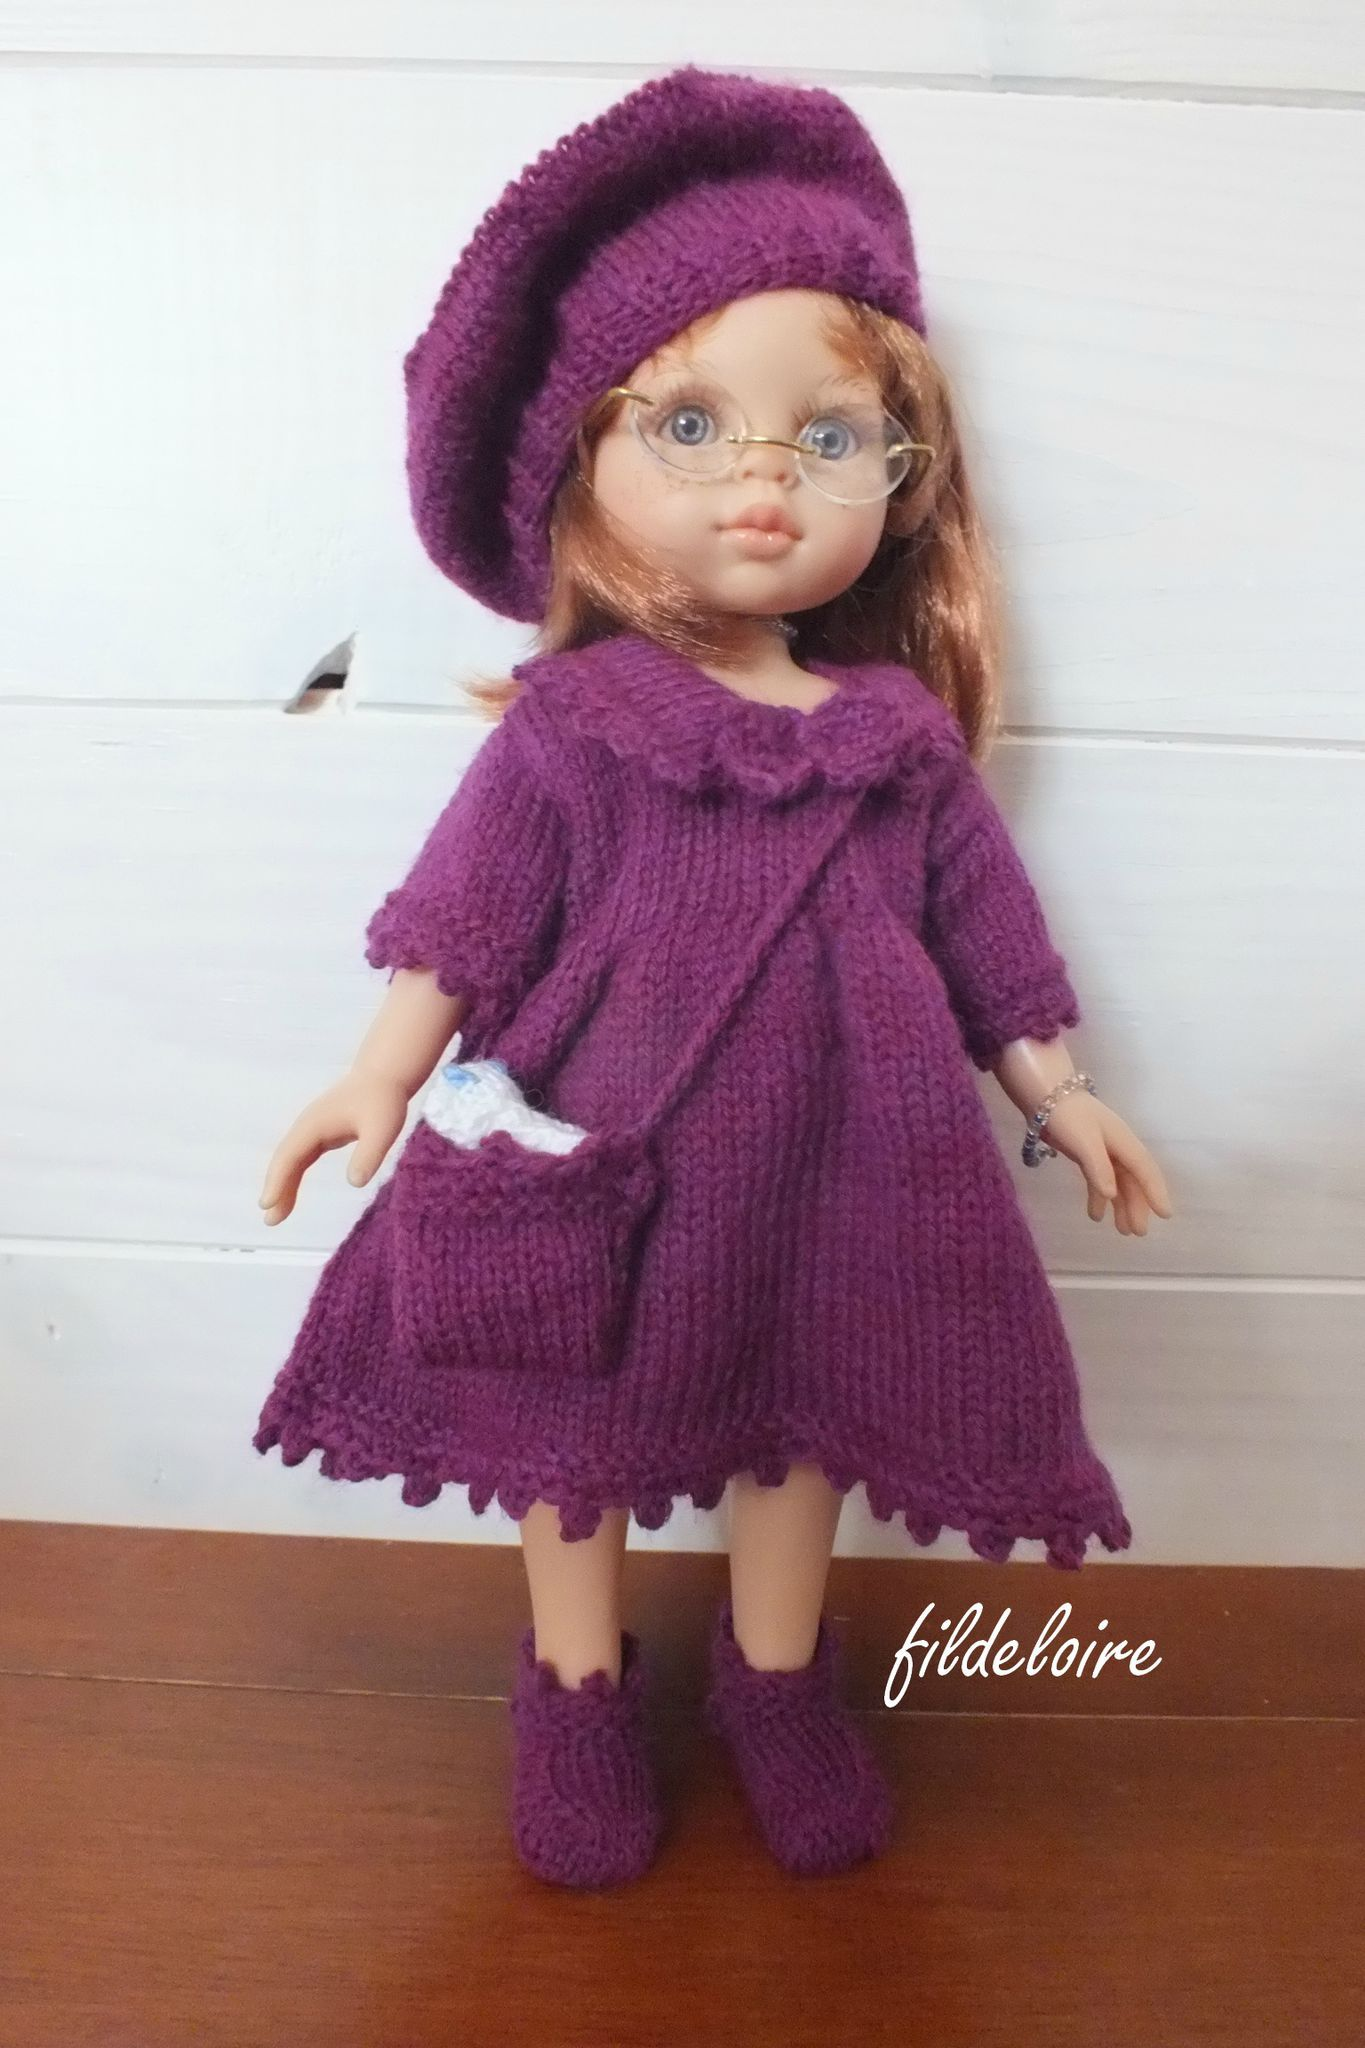 fildeloire: v19 | Dolls Knit Fashion C&P | Pinterest | Puppen